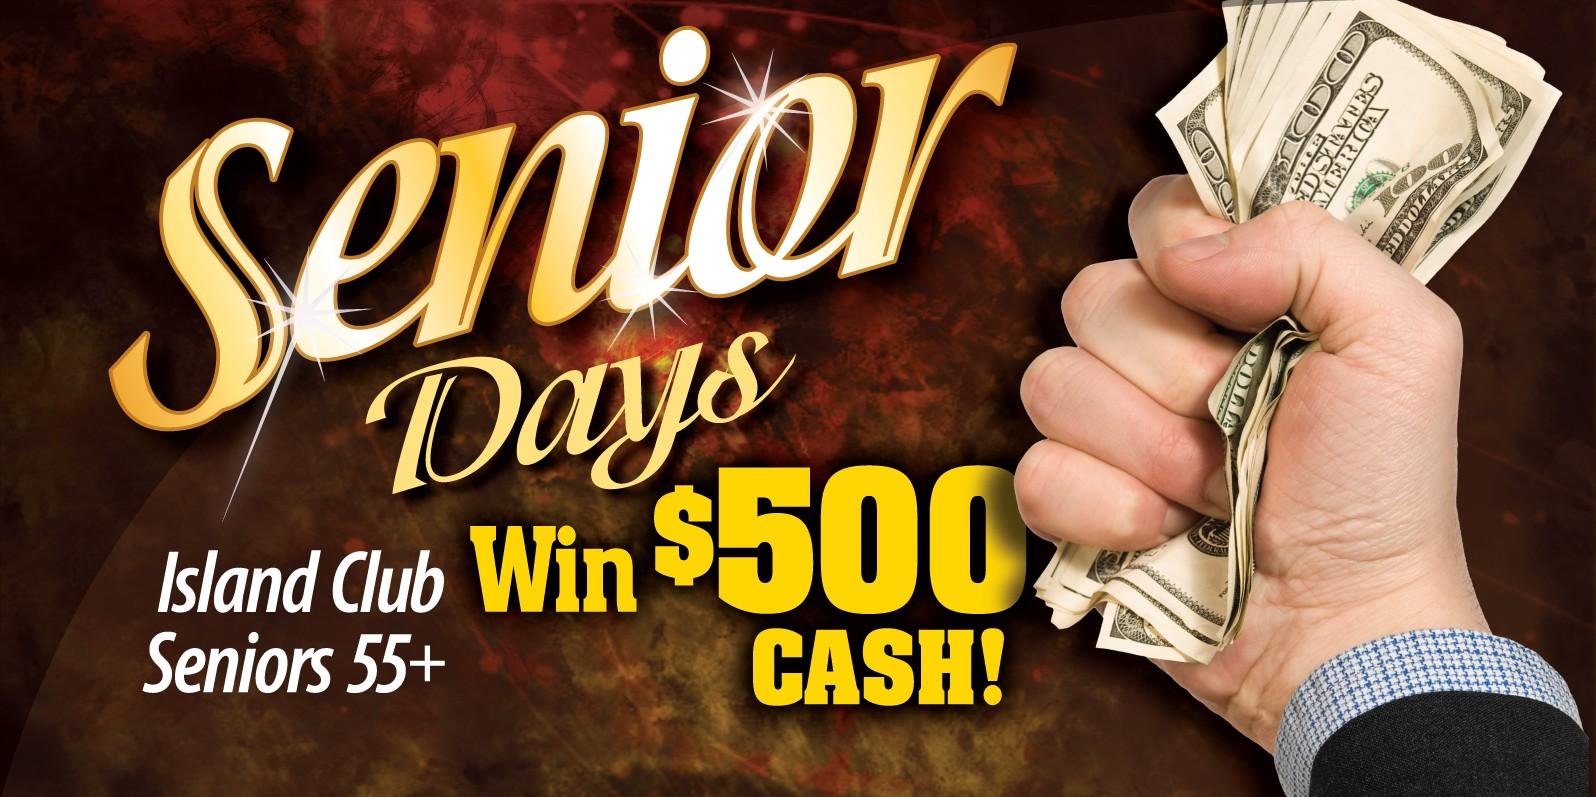 Seniors Win $500 Cash August '14